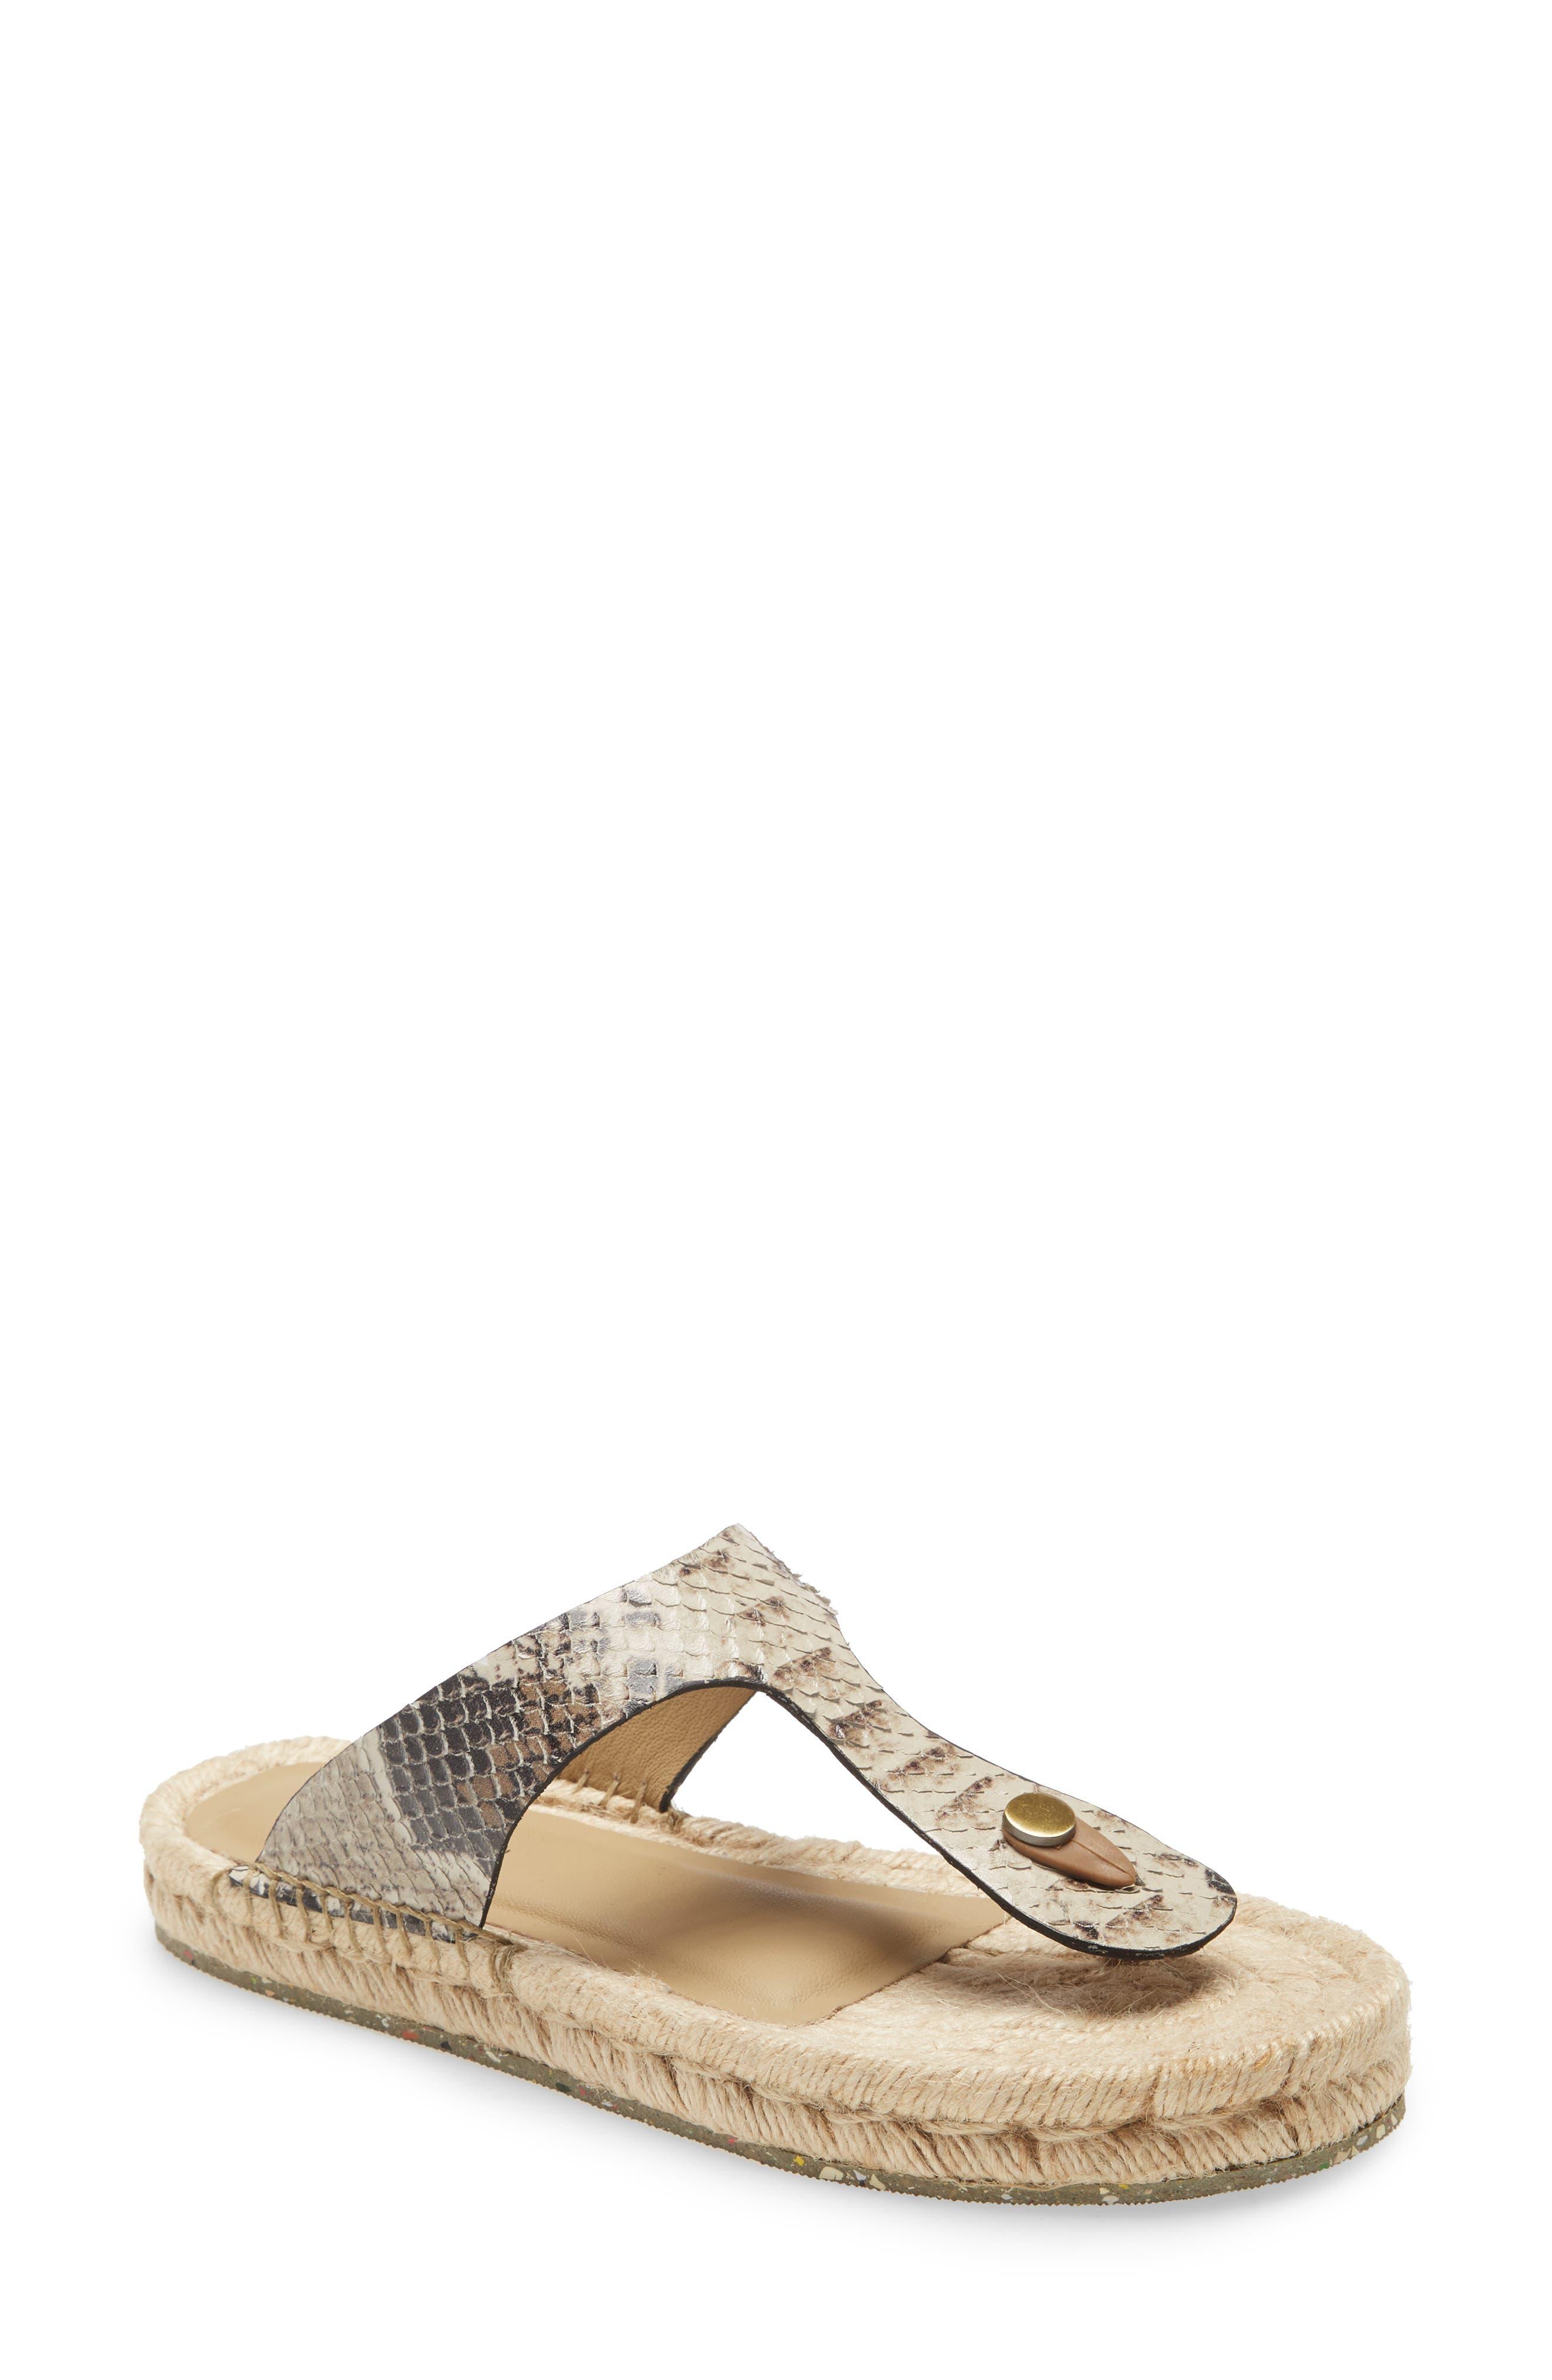 Bernat Leather & Jute Flip Flop